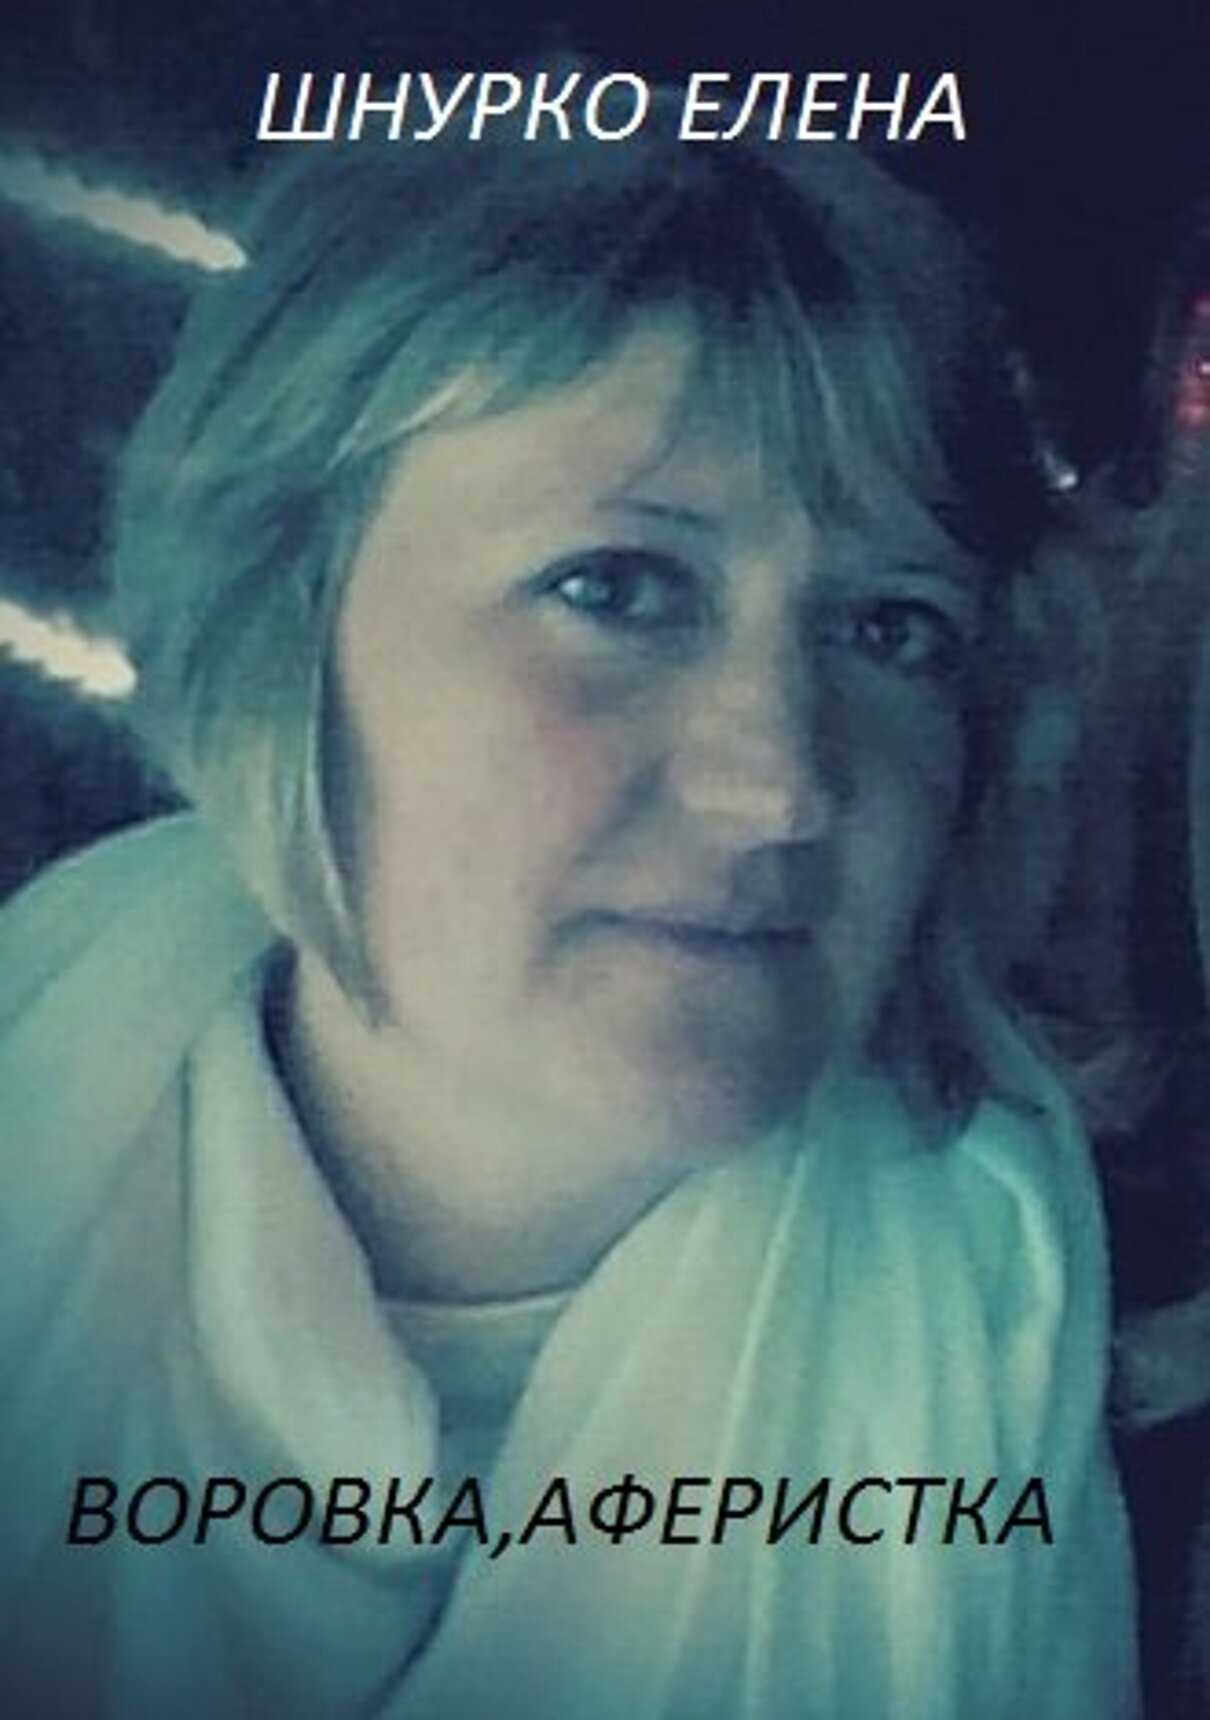 Жалоба-отзыв: Шнурко Елена Викторовна - Воровка.Аферистка